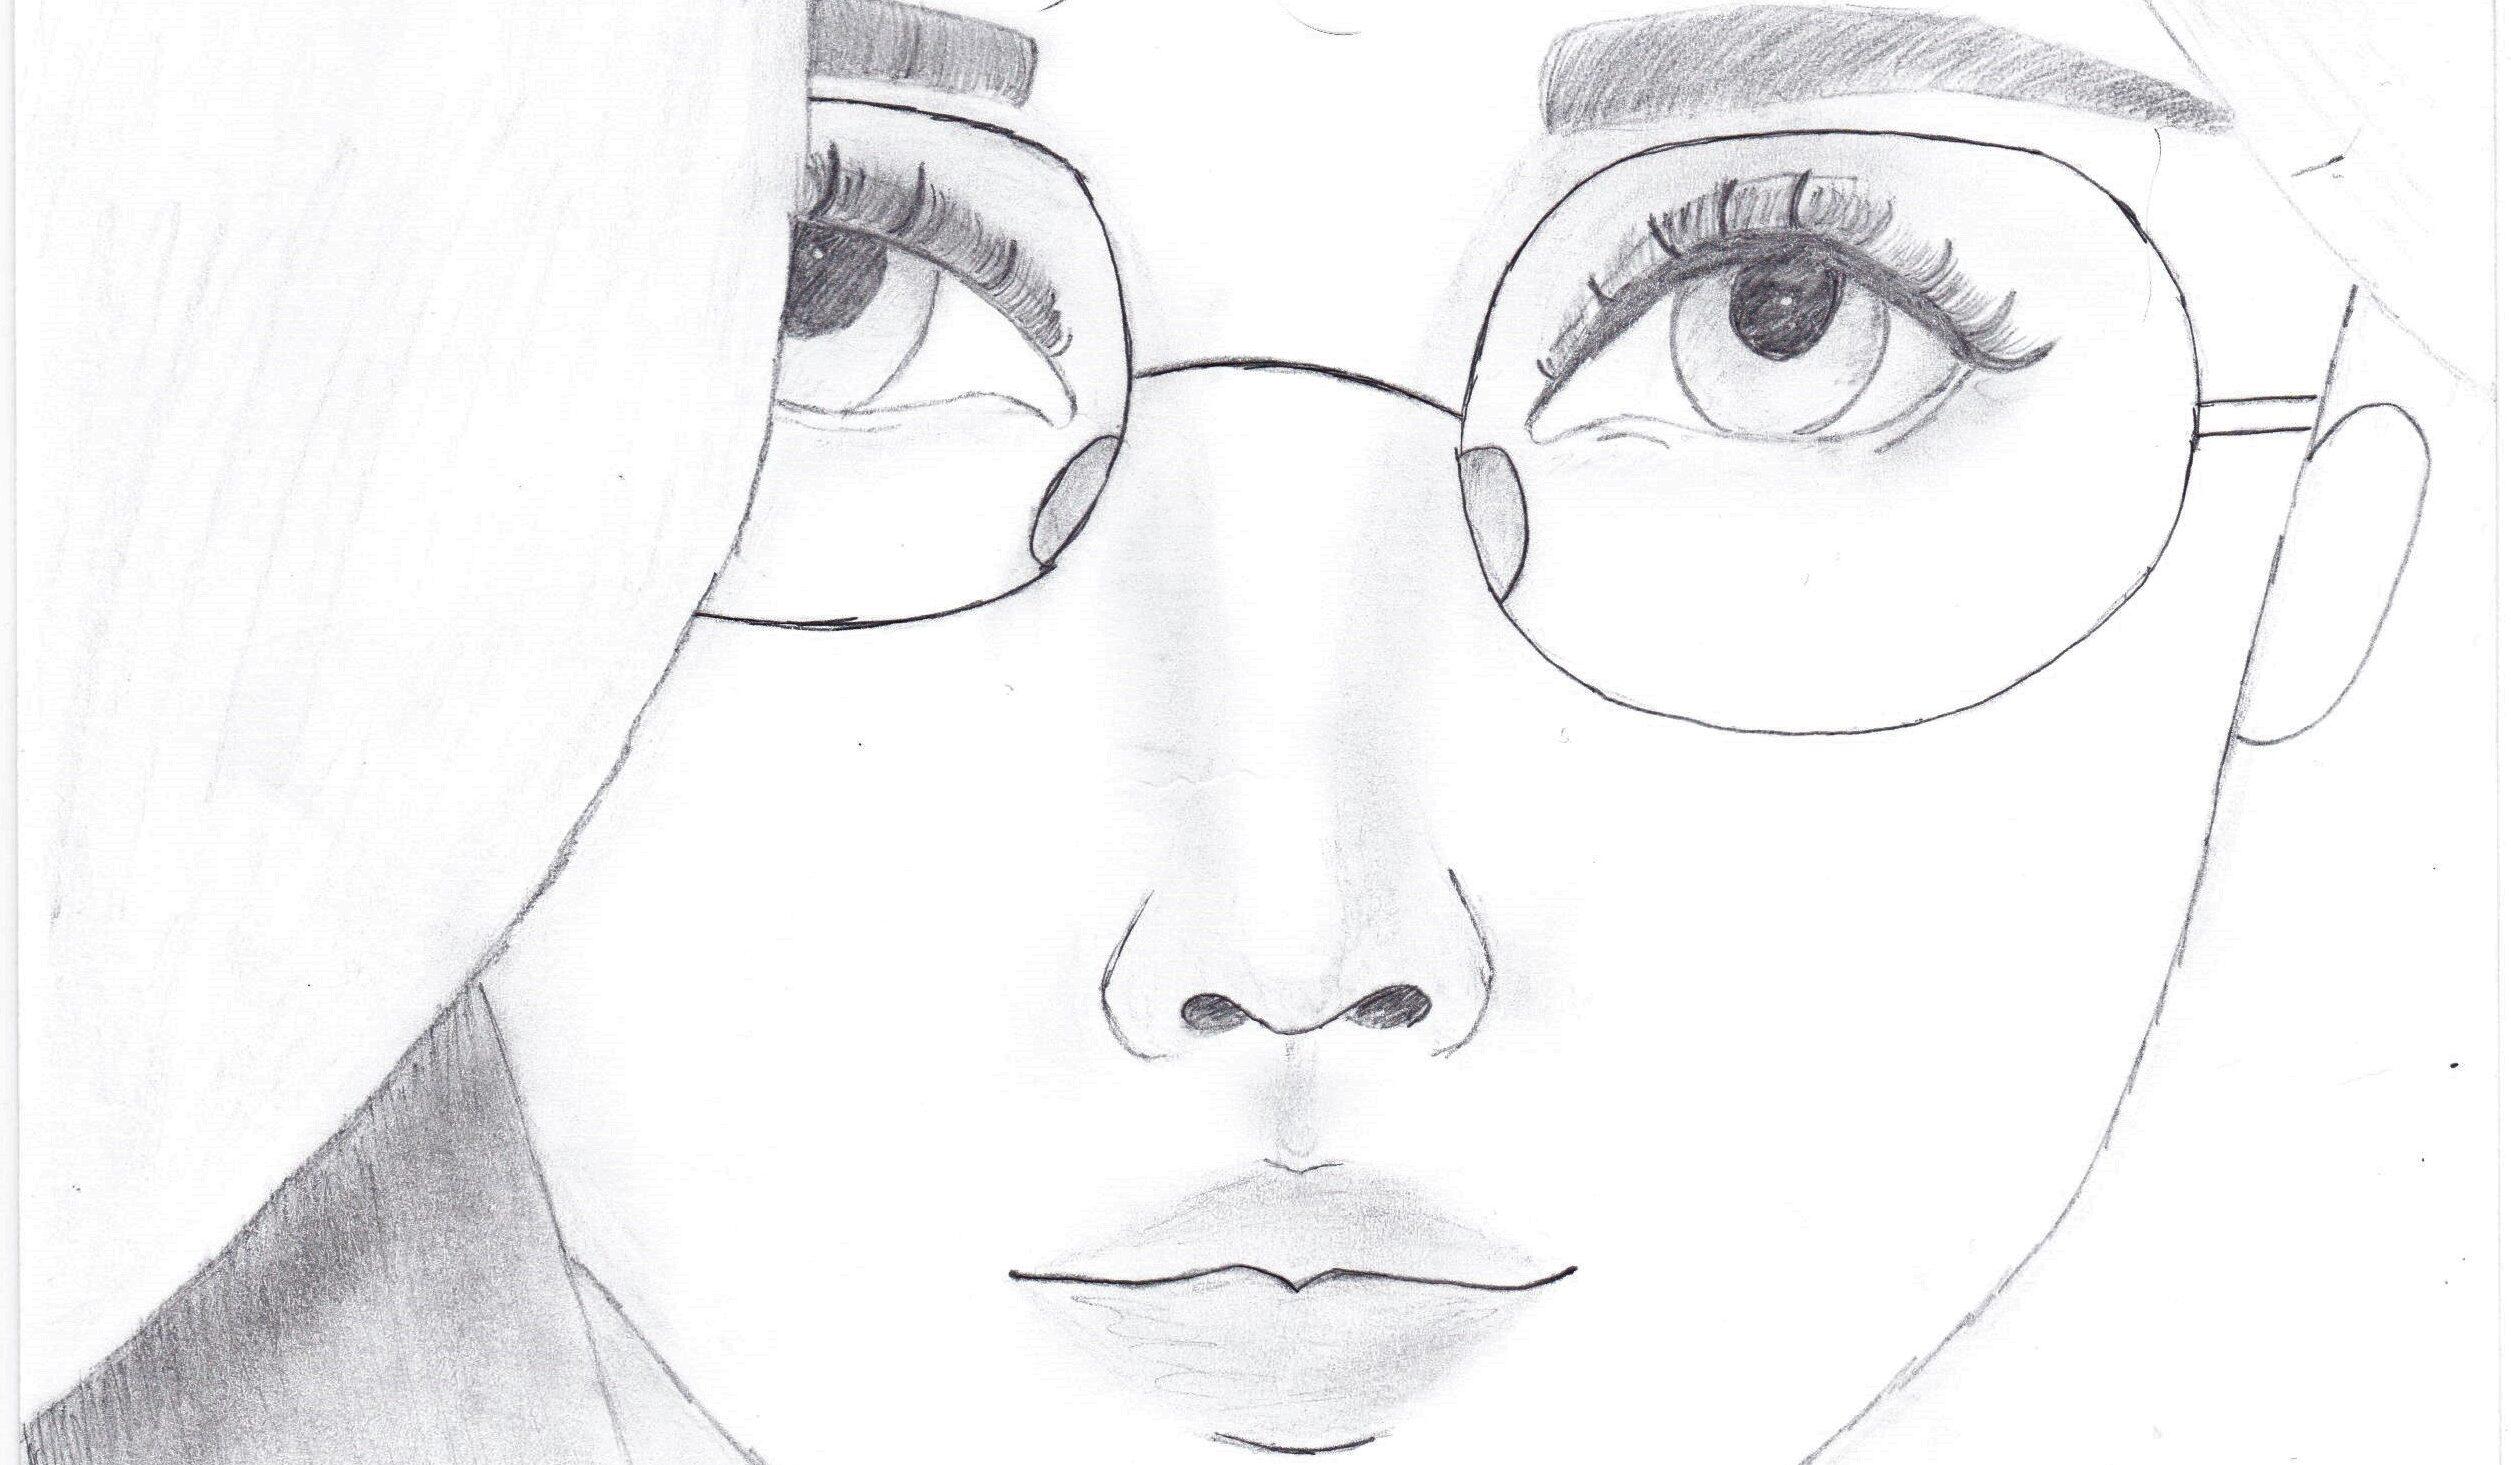 dessin-2.jpeg